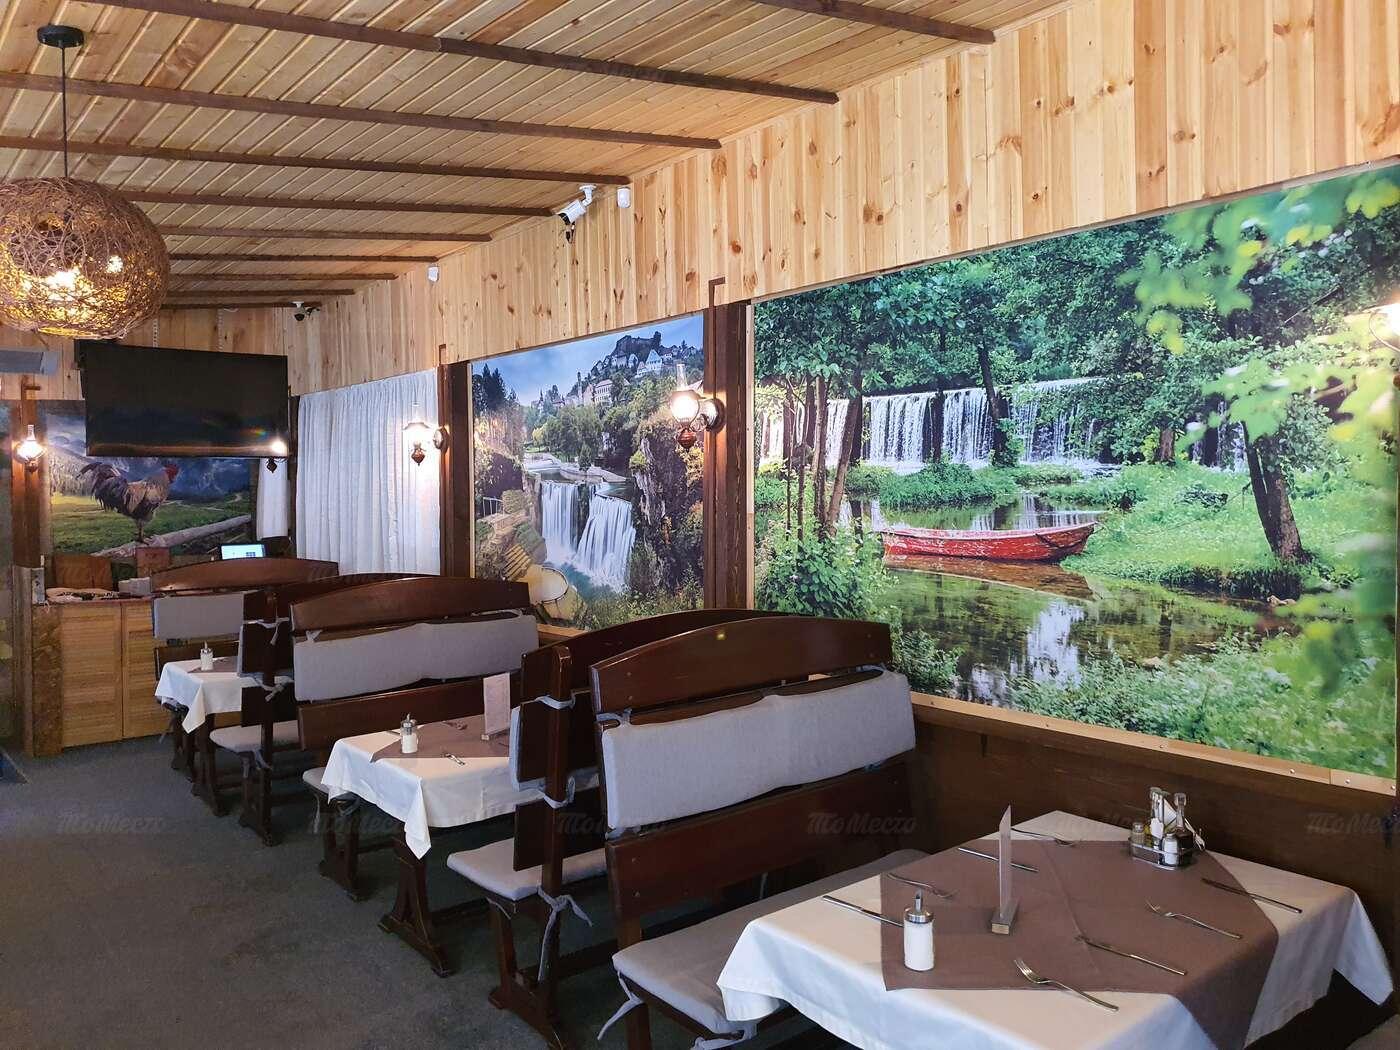 Ресторан Балканский Гурман на Декабристов фото 4